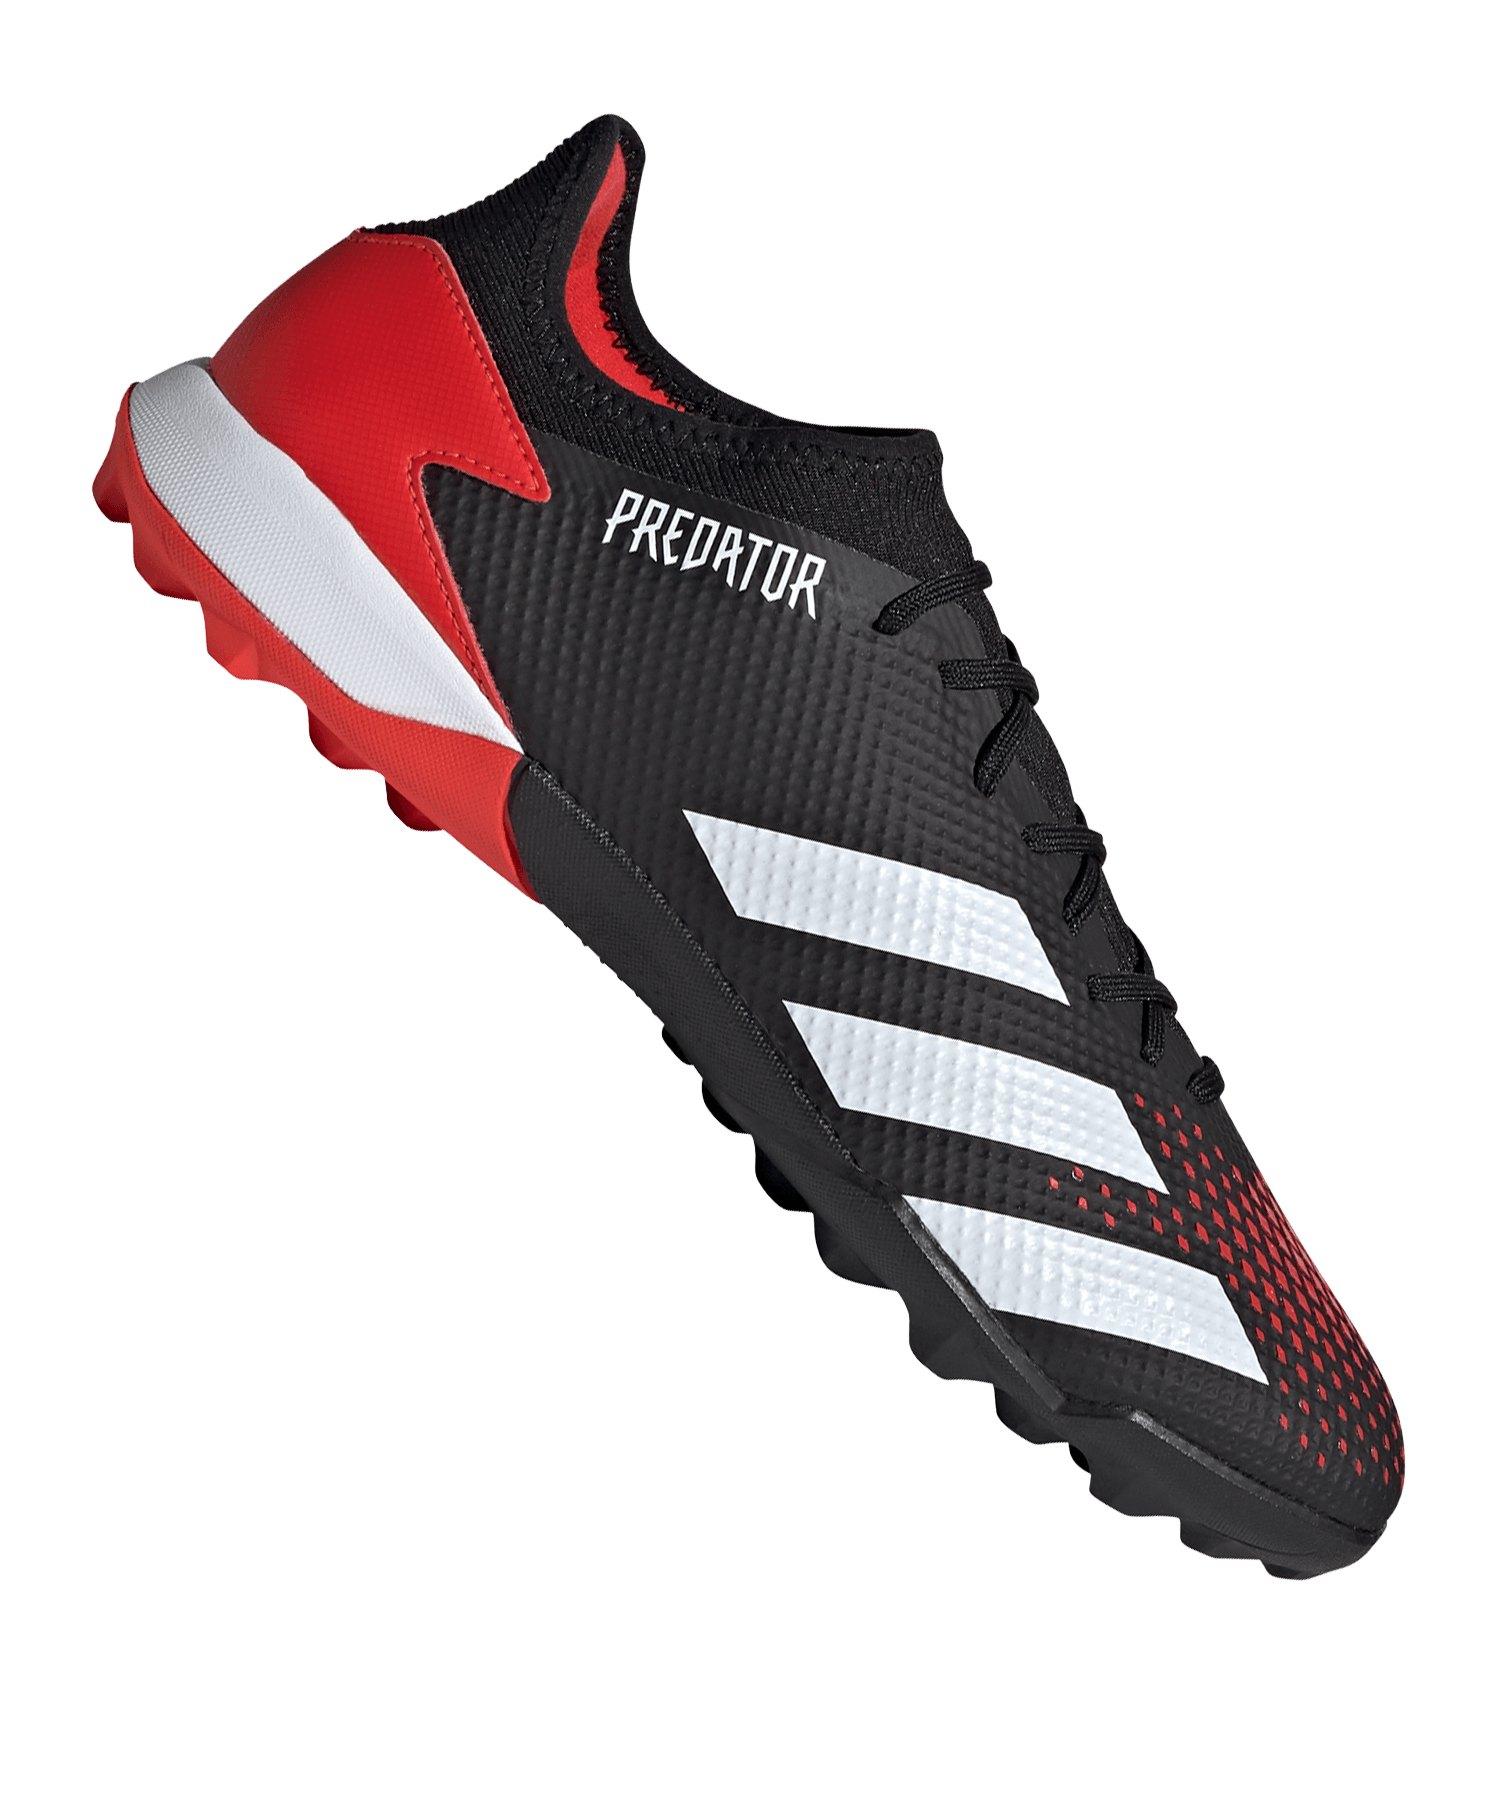 adidas Predator Mutator 20.3 L TF Schwarz Rot - schwarz